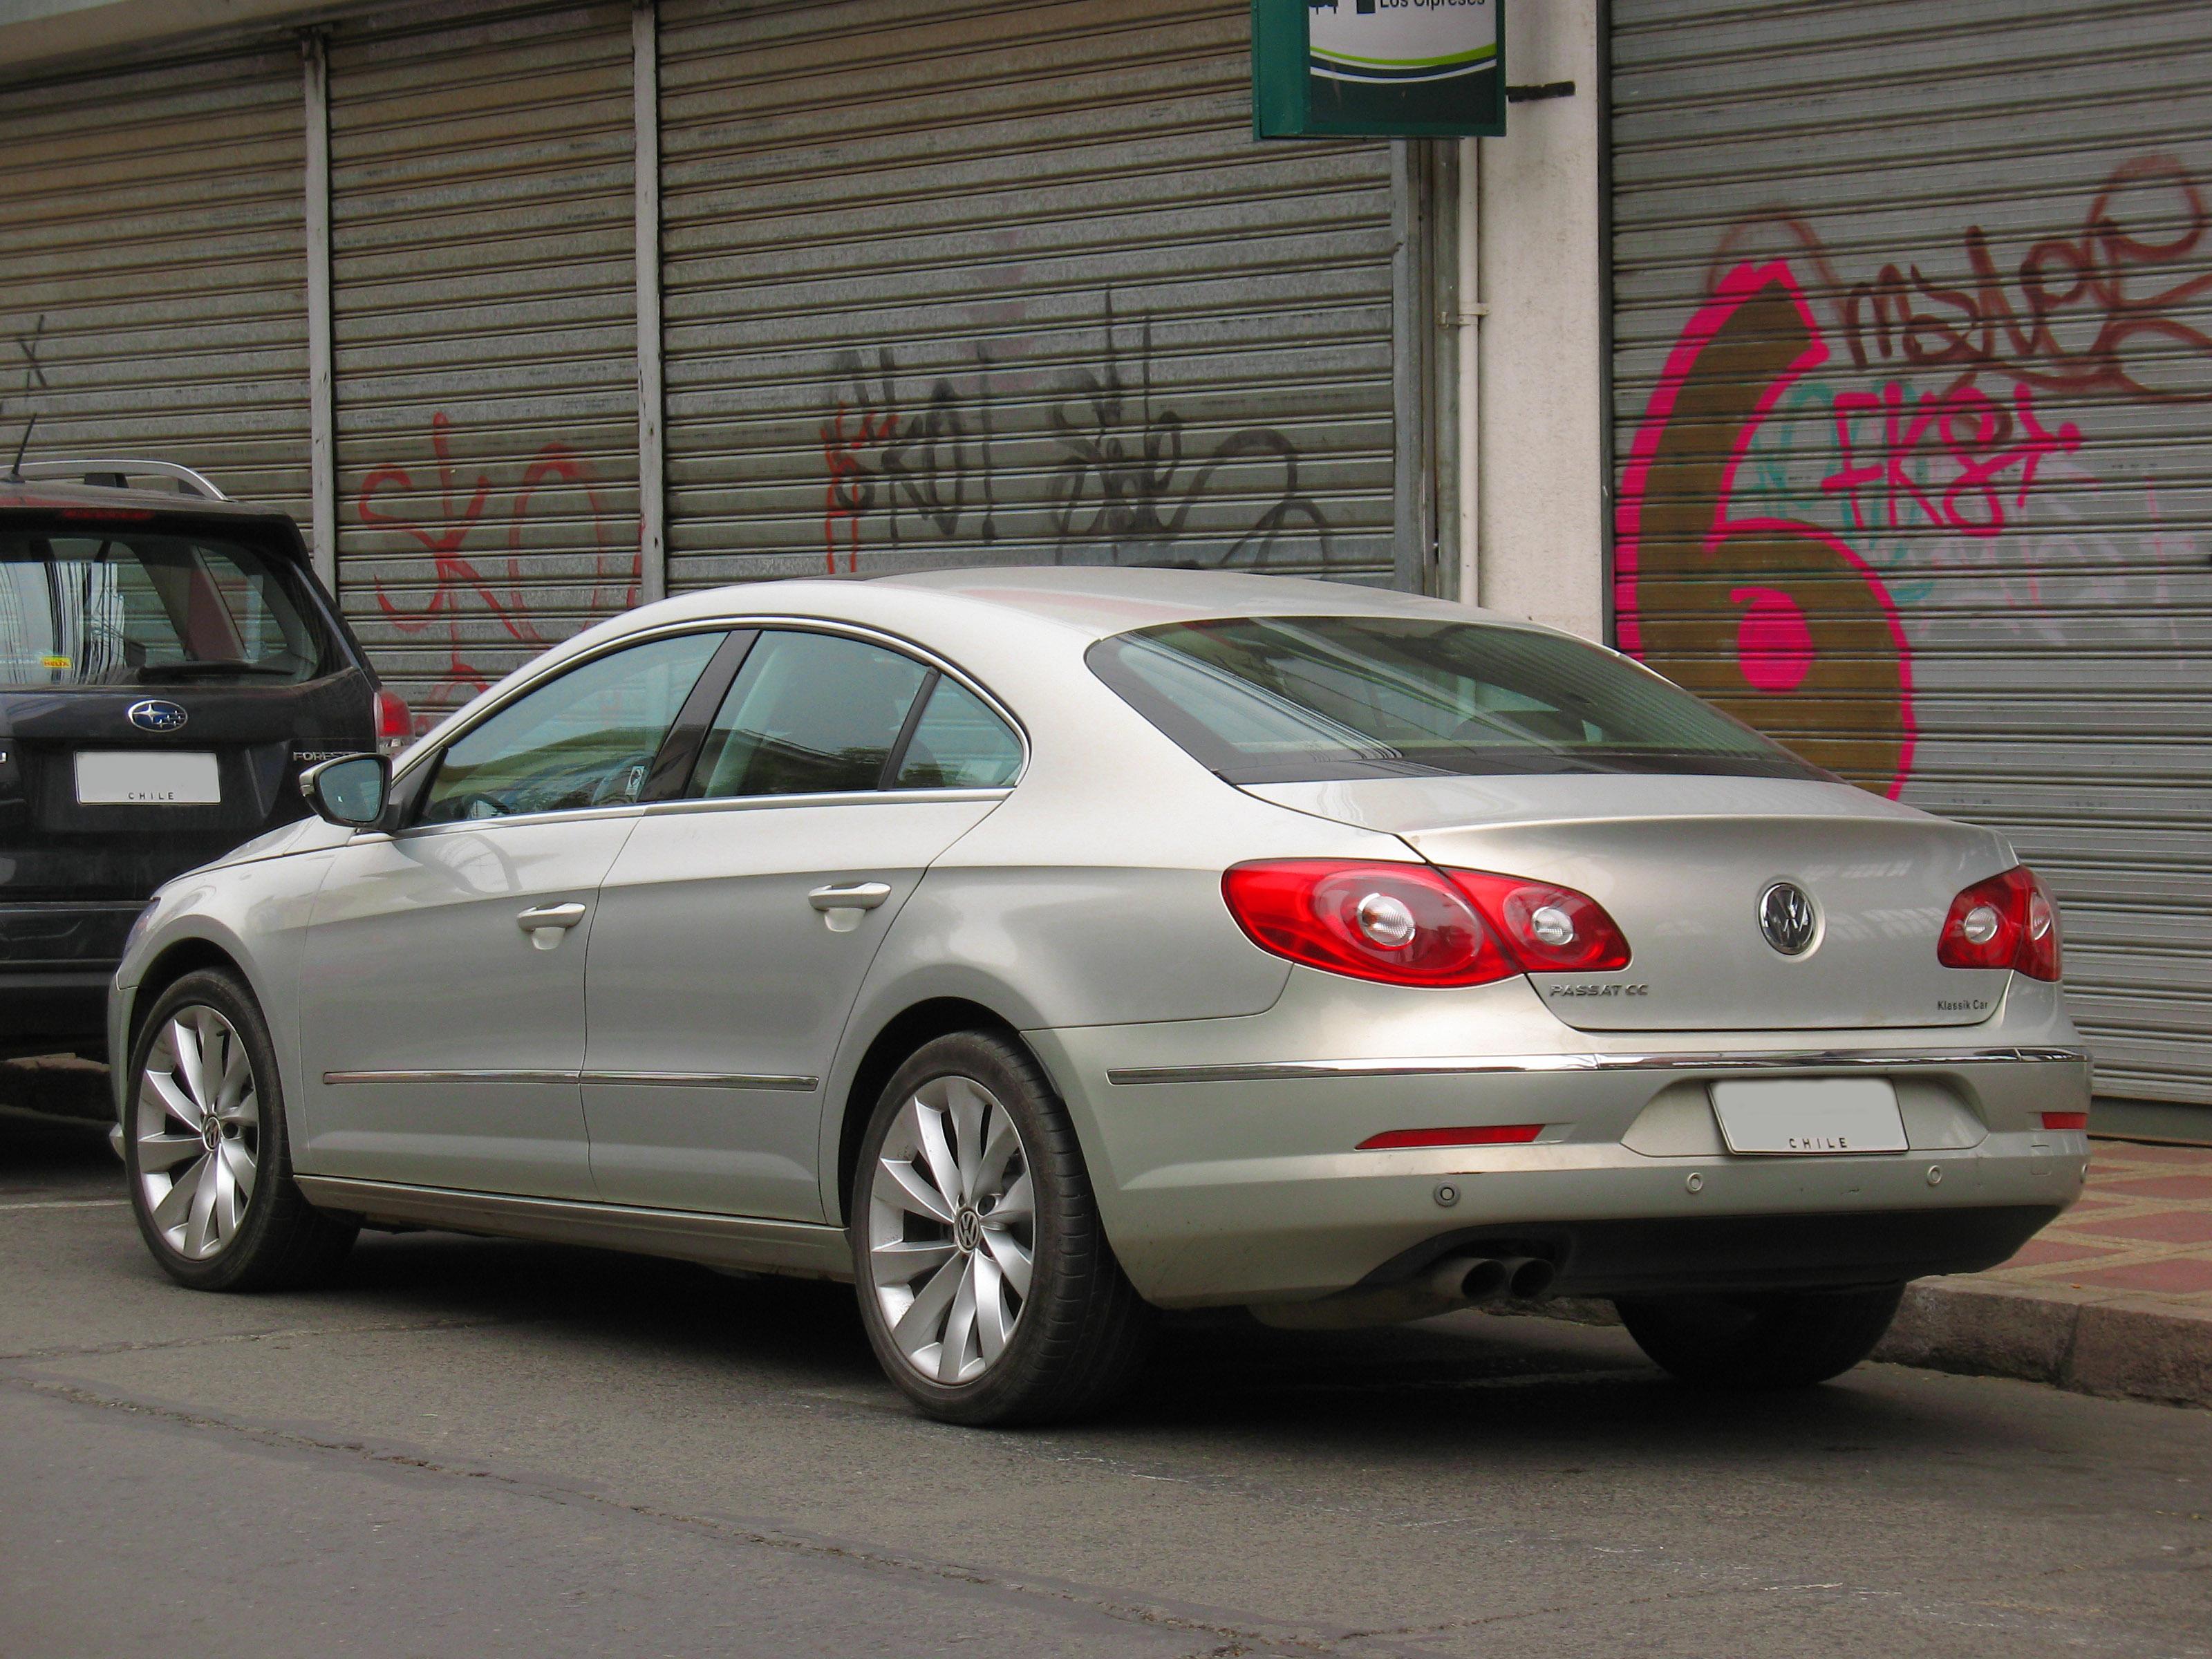 morris motors passat specs features trend volkswagen vw selp blog premium county and dig nj interior pas lease